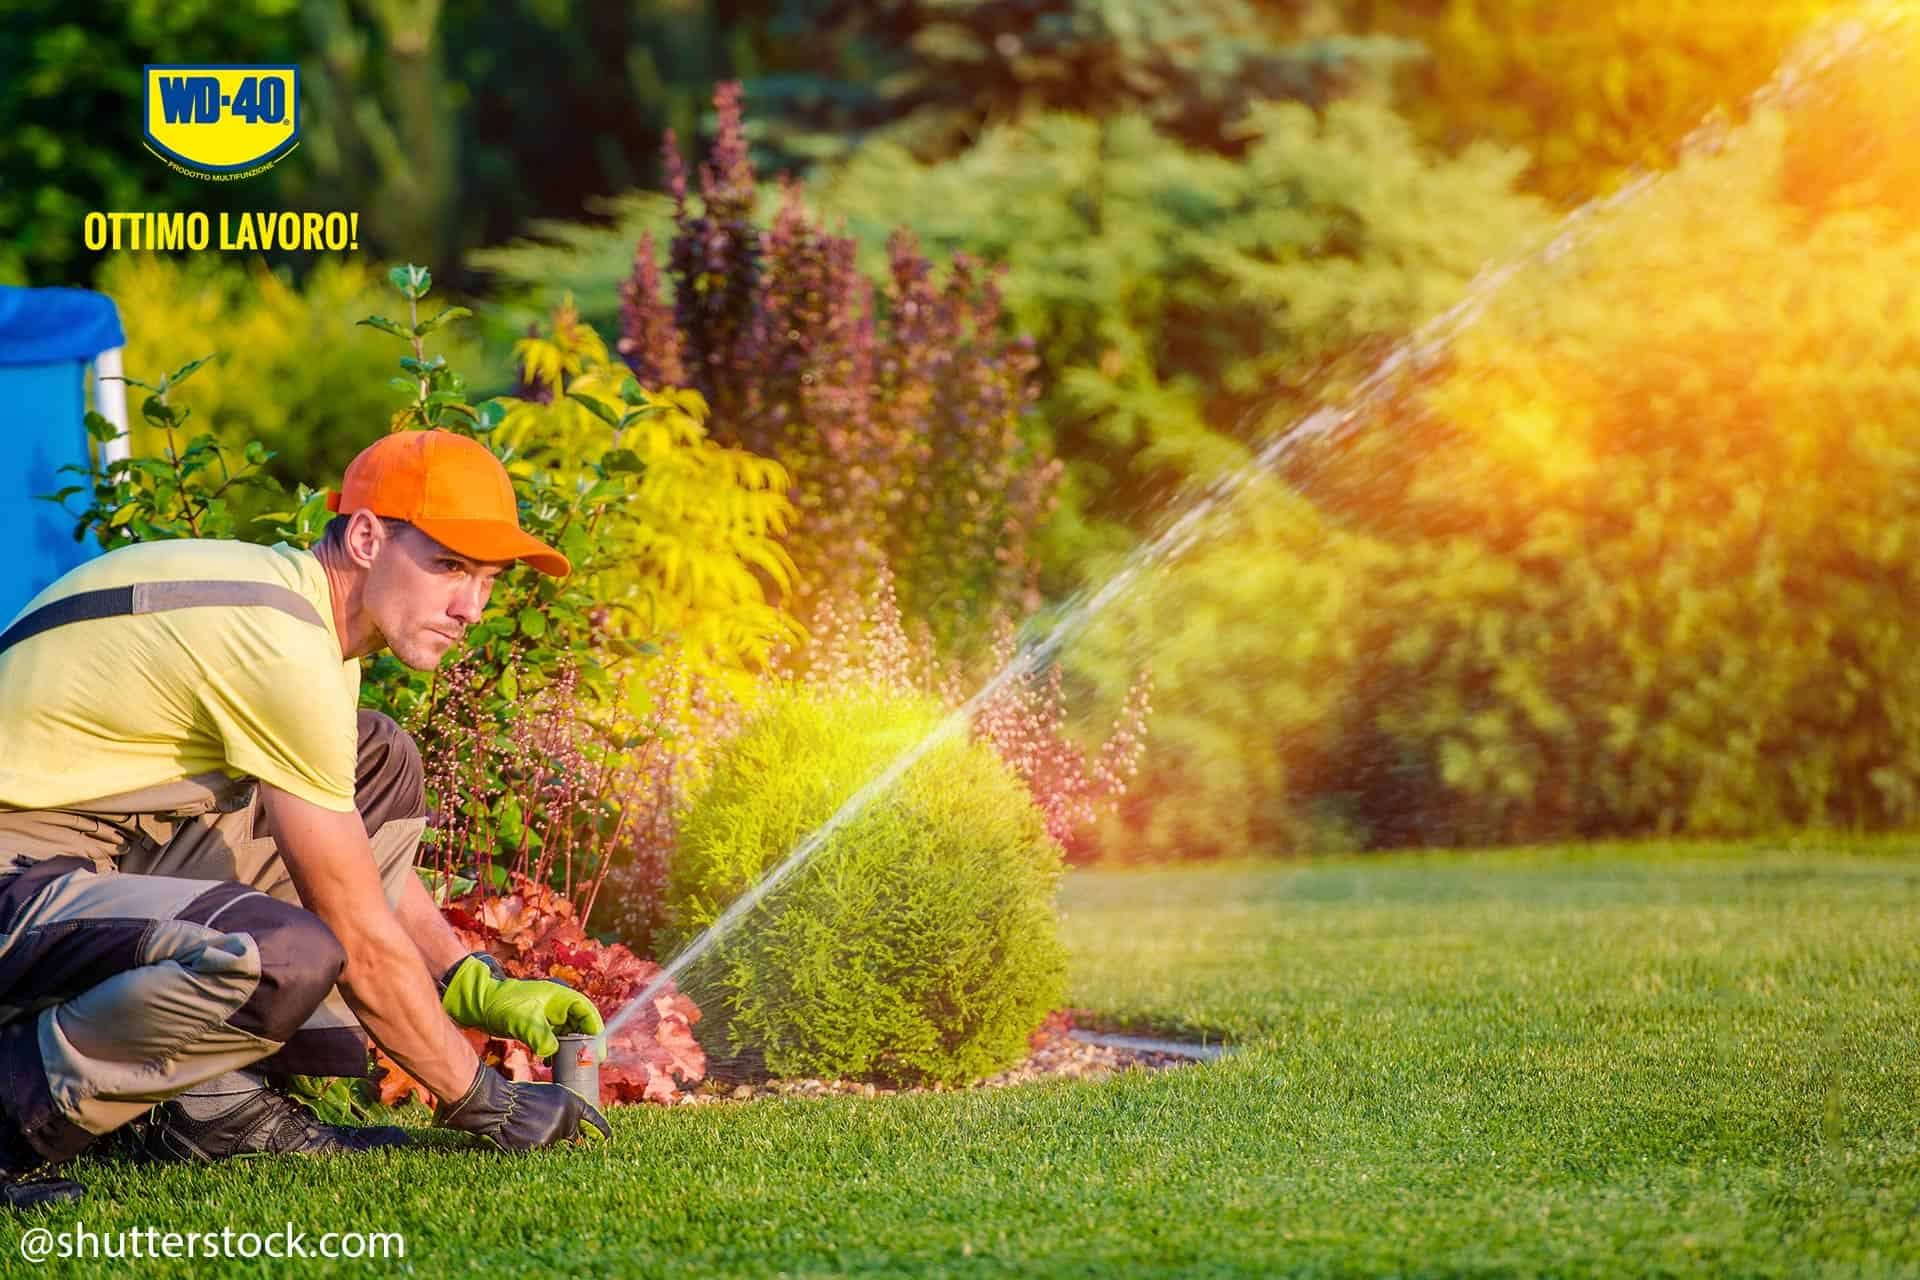 pulire irrigatori